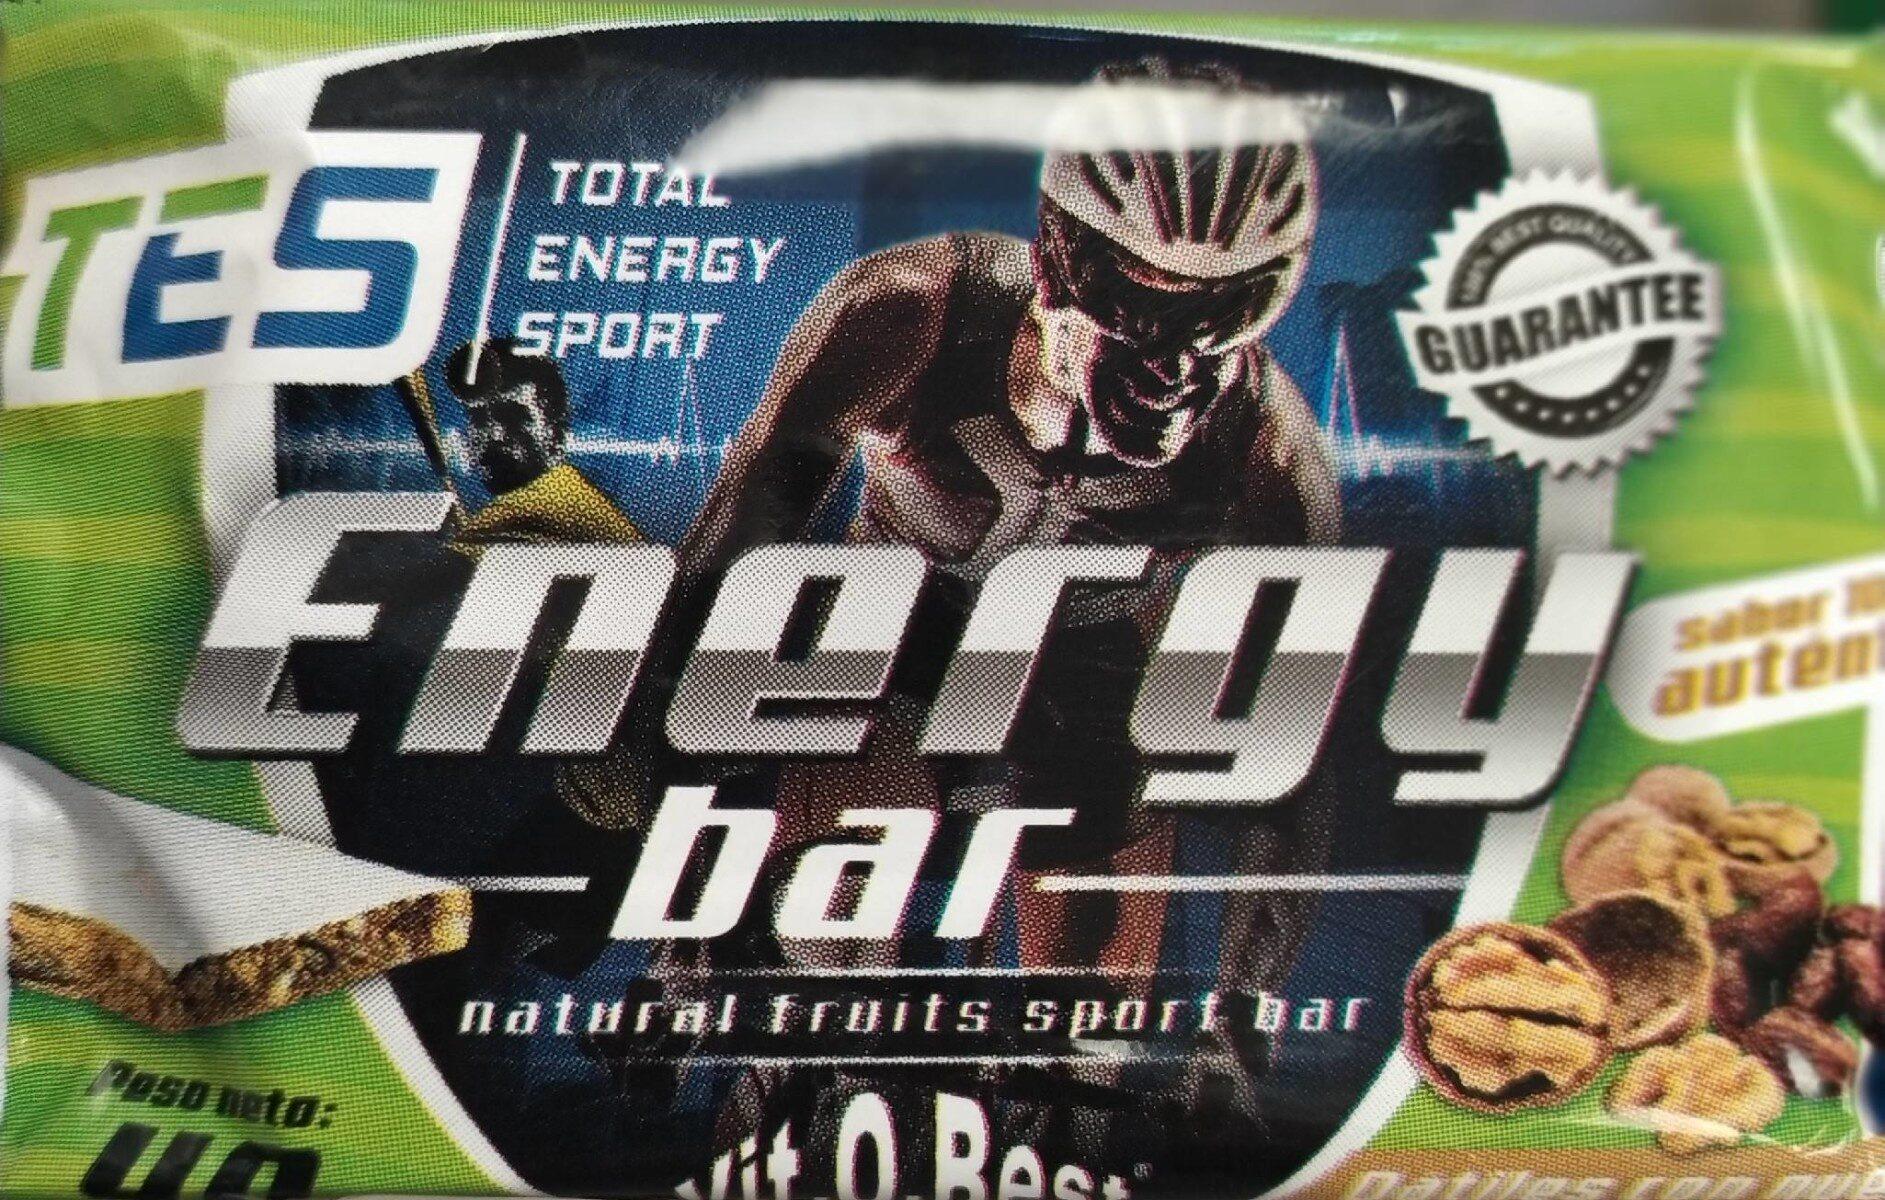 Energy bar - Product